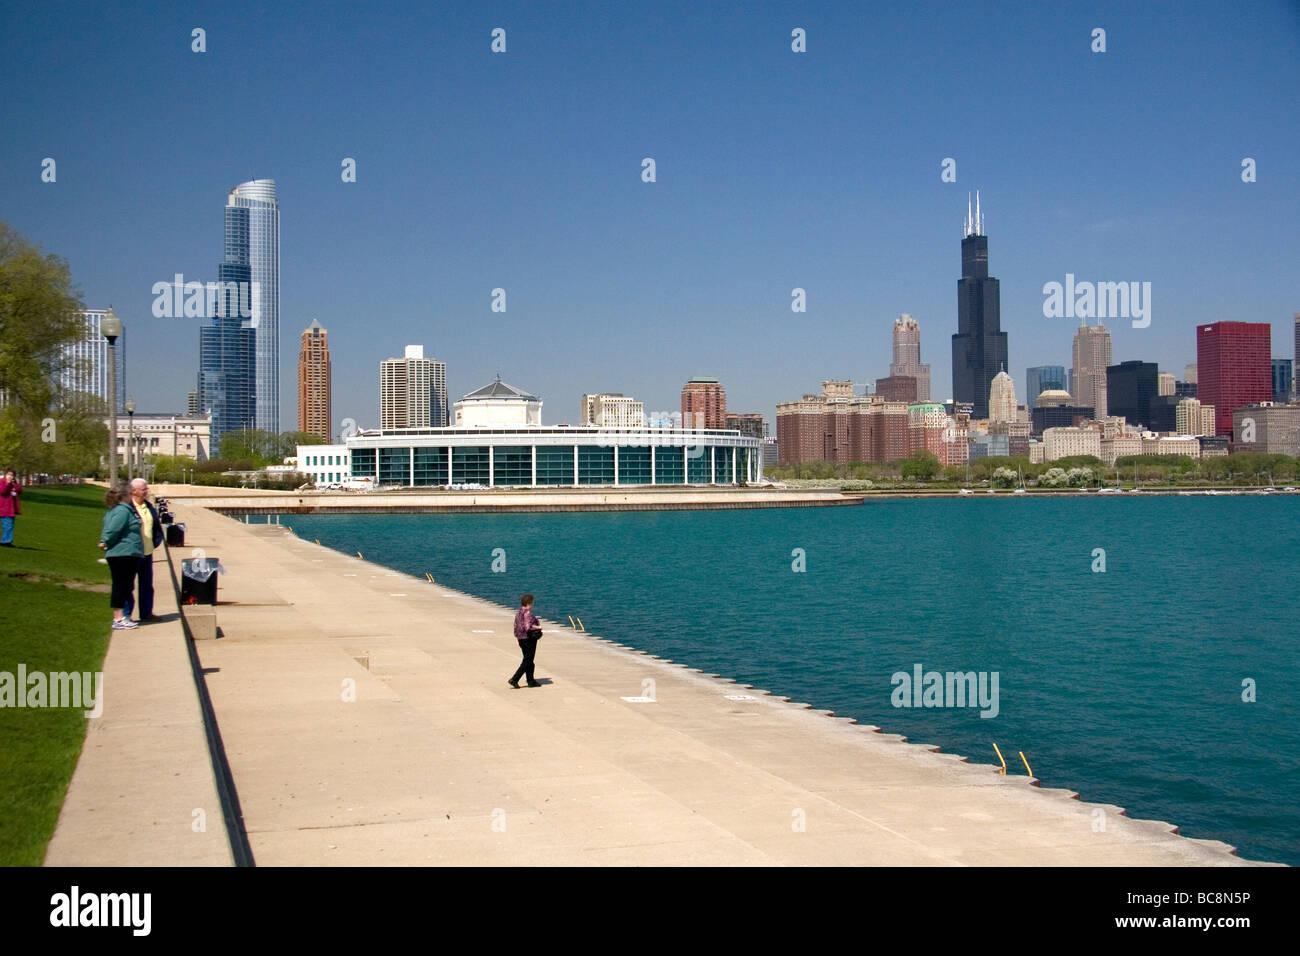 Shedd Aquarium Located On The Shore Of Lake Michigan In Chicago - Michigan location in usa